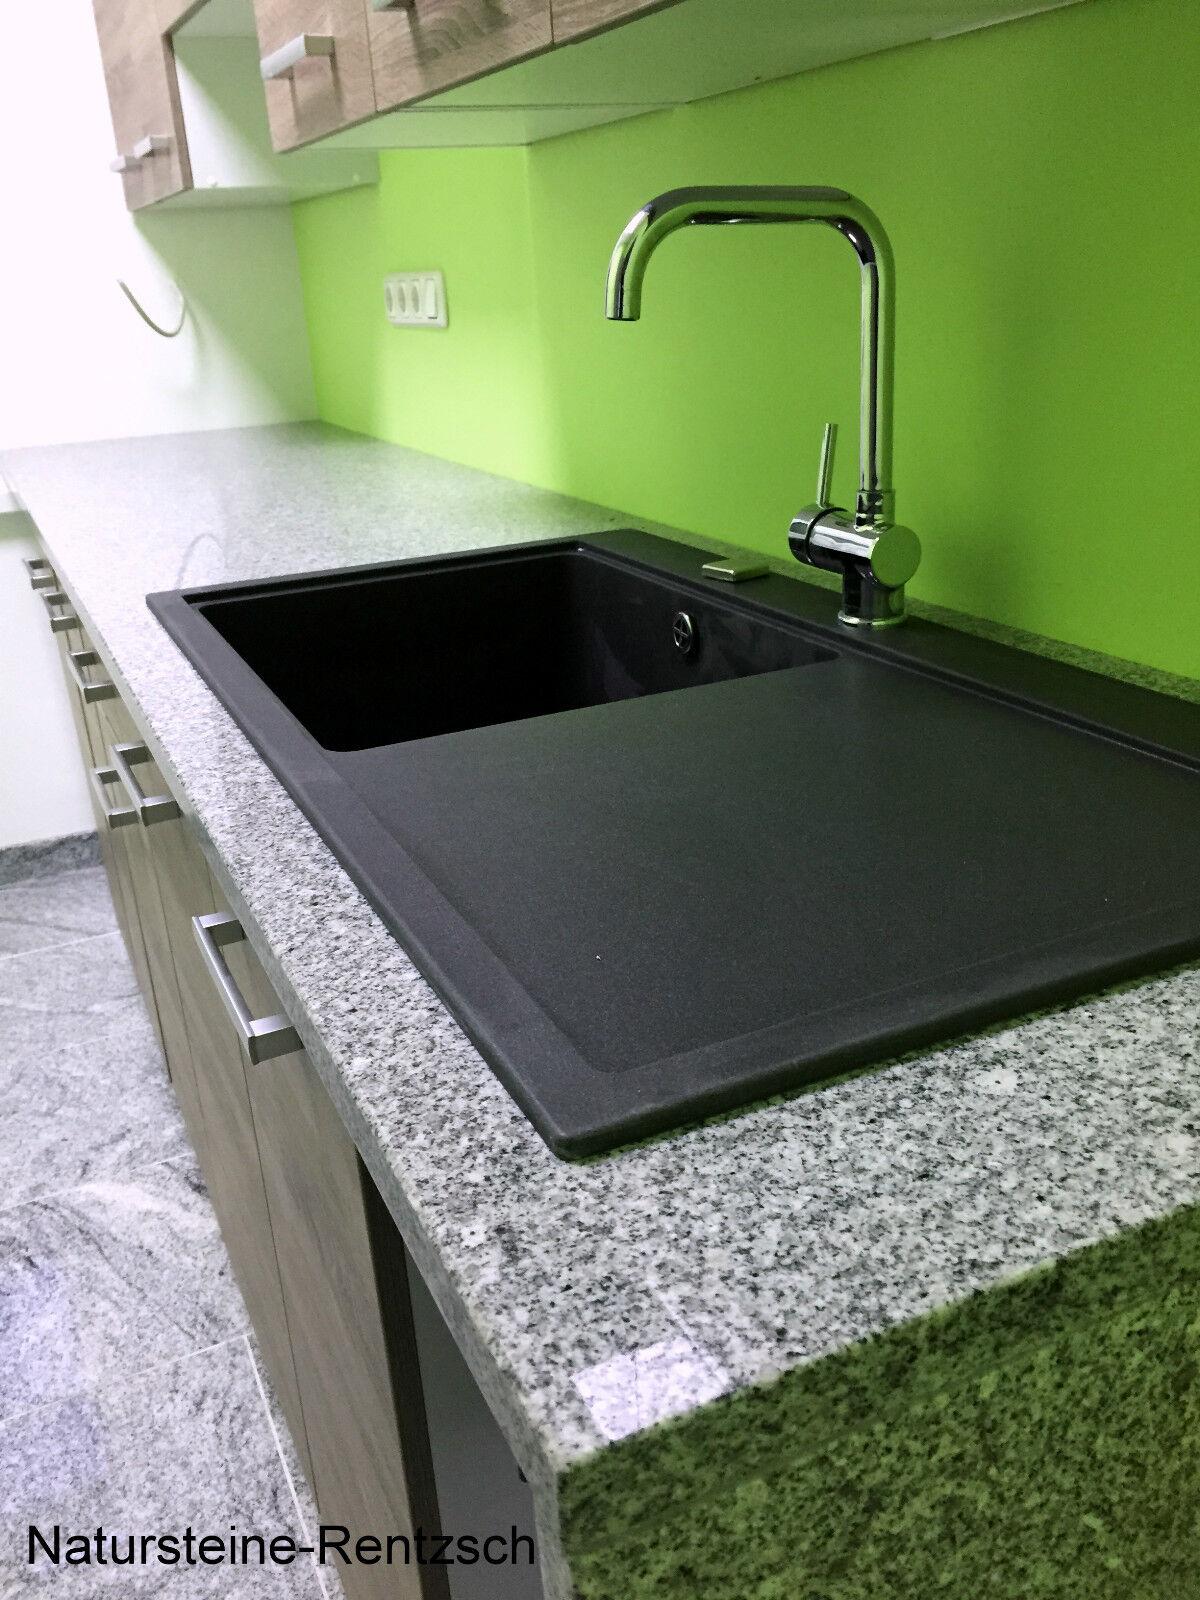 arbeitsplatte abdeckung k che k chenarbeitsplatte k chenplatte naturstein granit eur 109 99. Black Bedroom Furniture Sets. Home Design Ideas